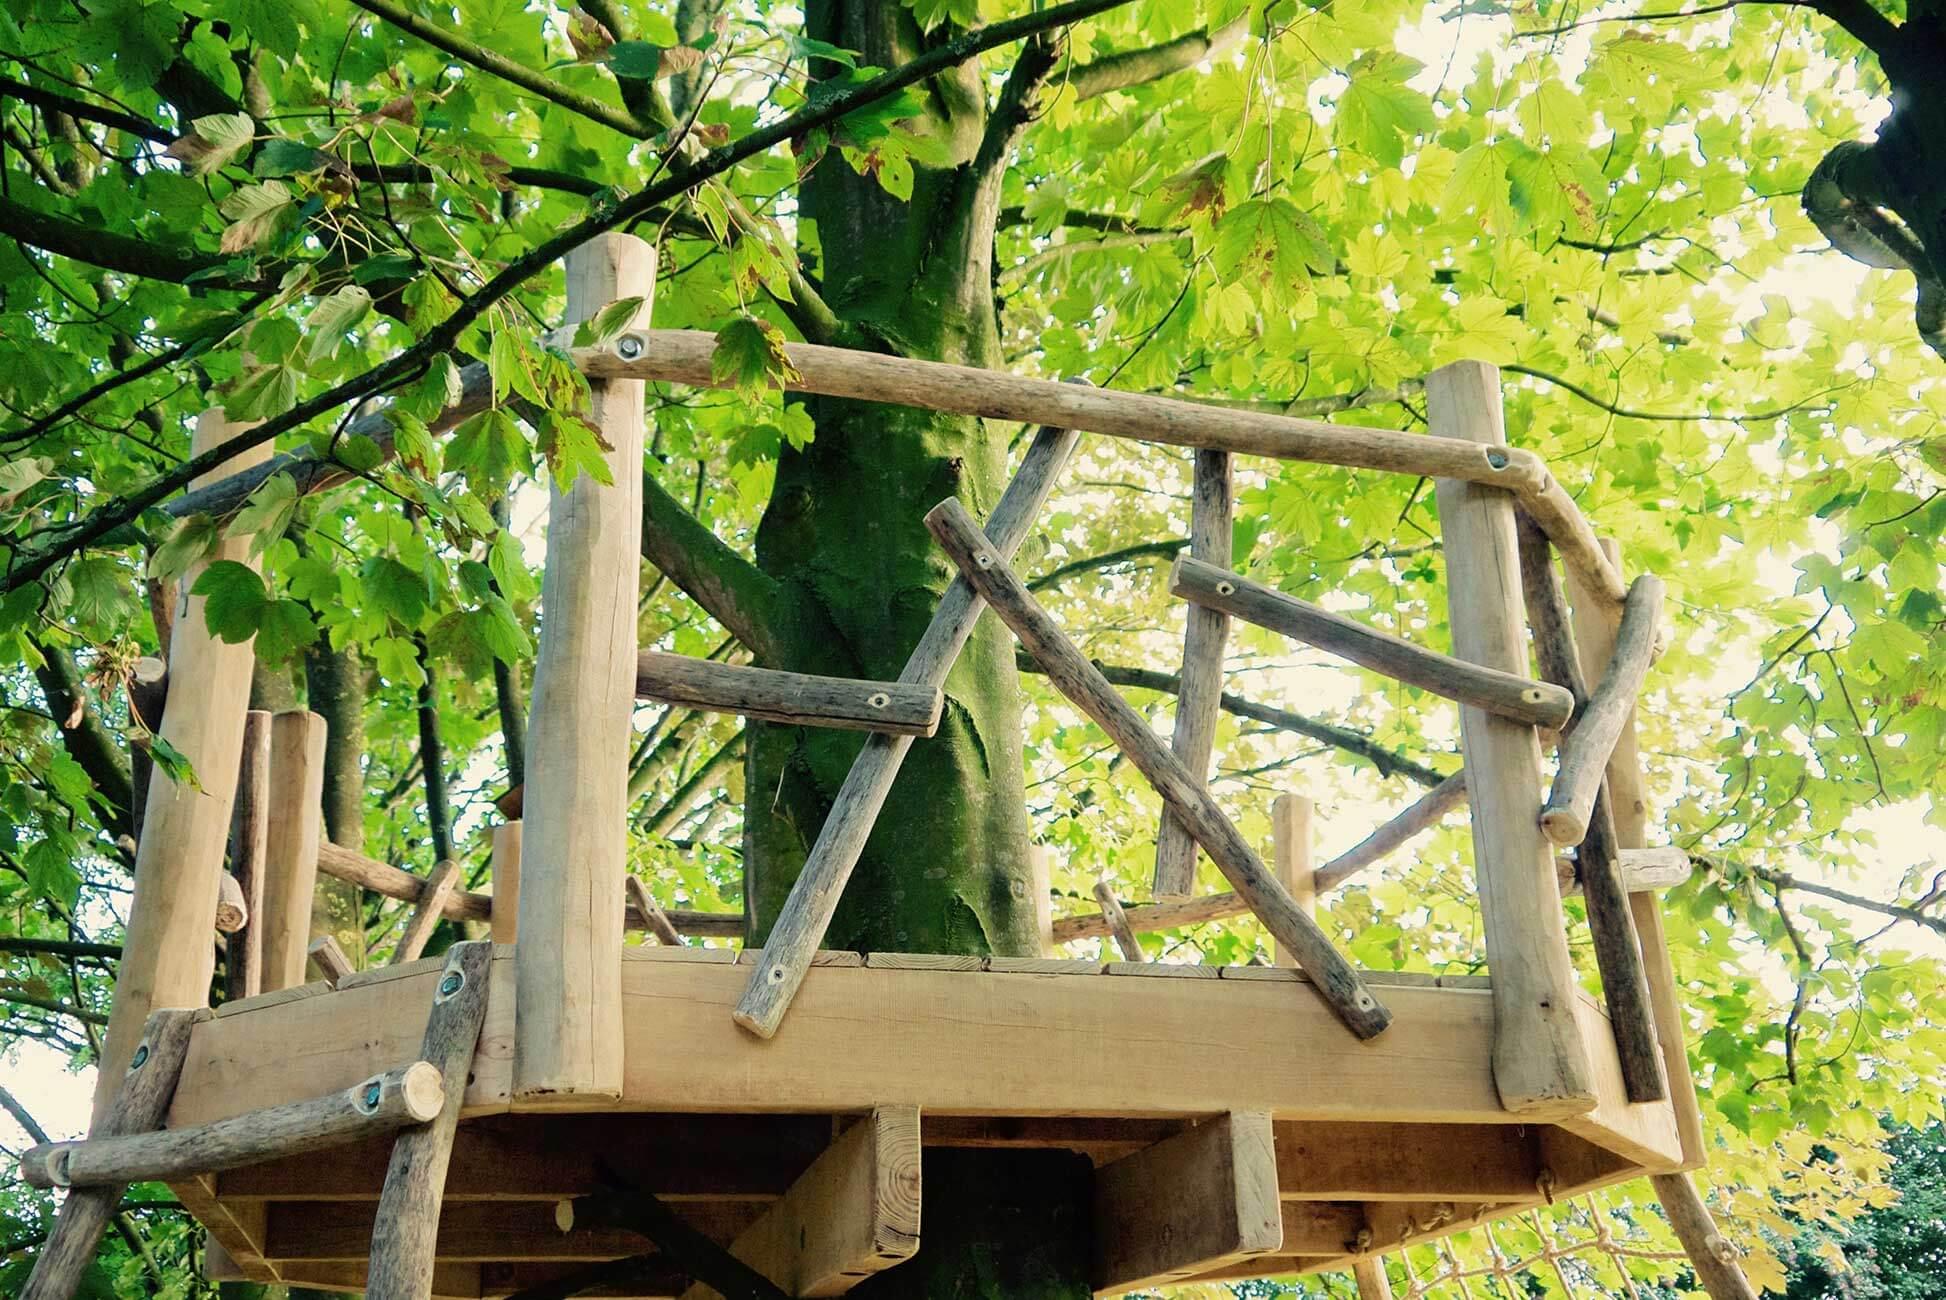 houten platform speeltoestel